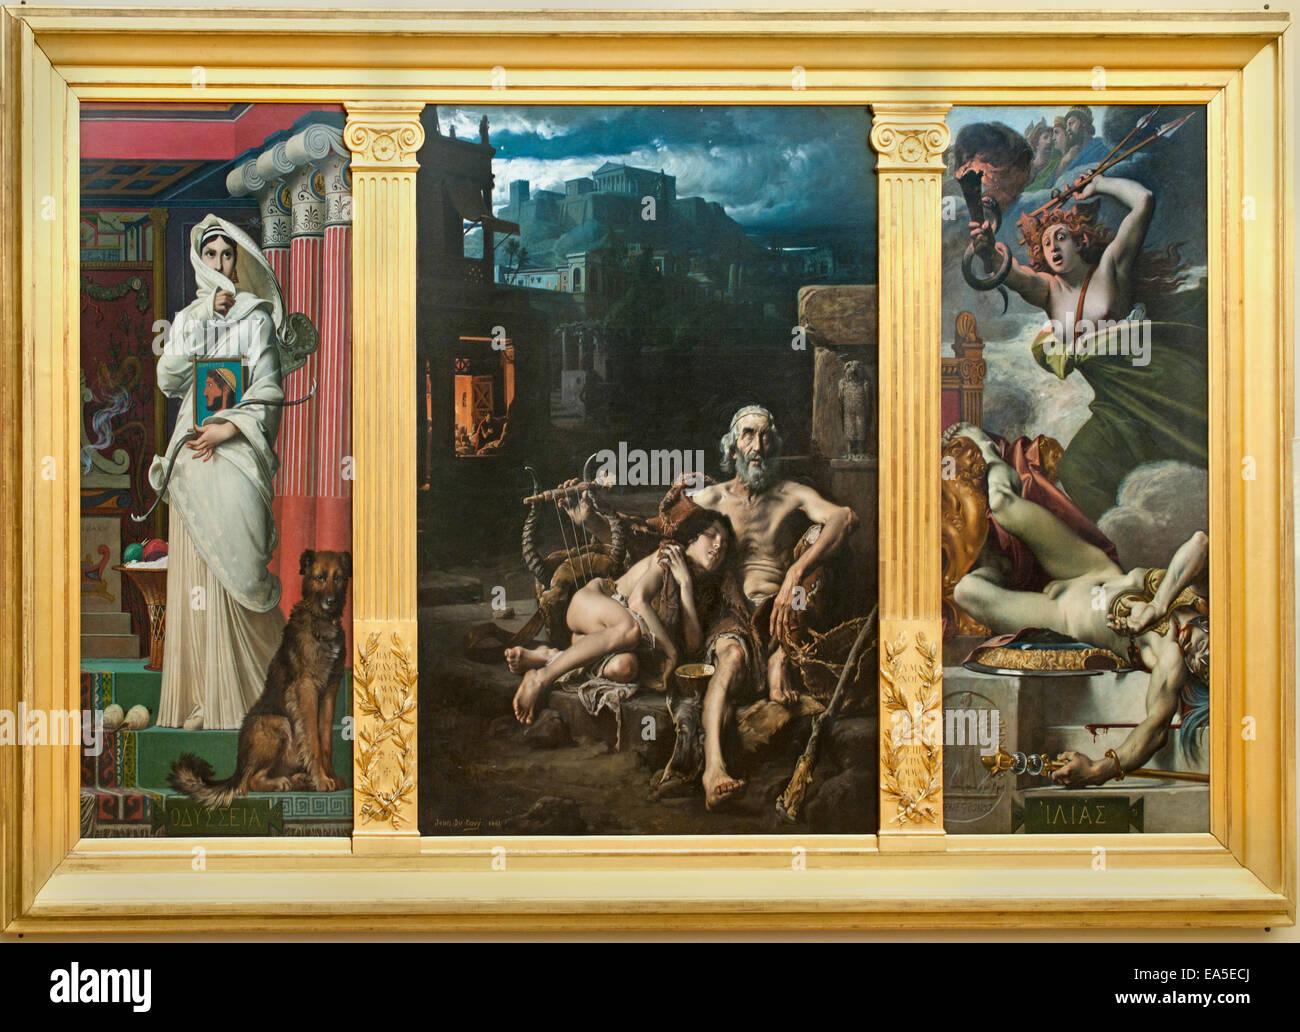 Homer beggar 1881 Triptych by Jean Jules Antoine Lecomte du Nouÿ 1842-1923 France French - Stock Image